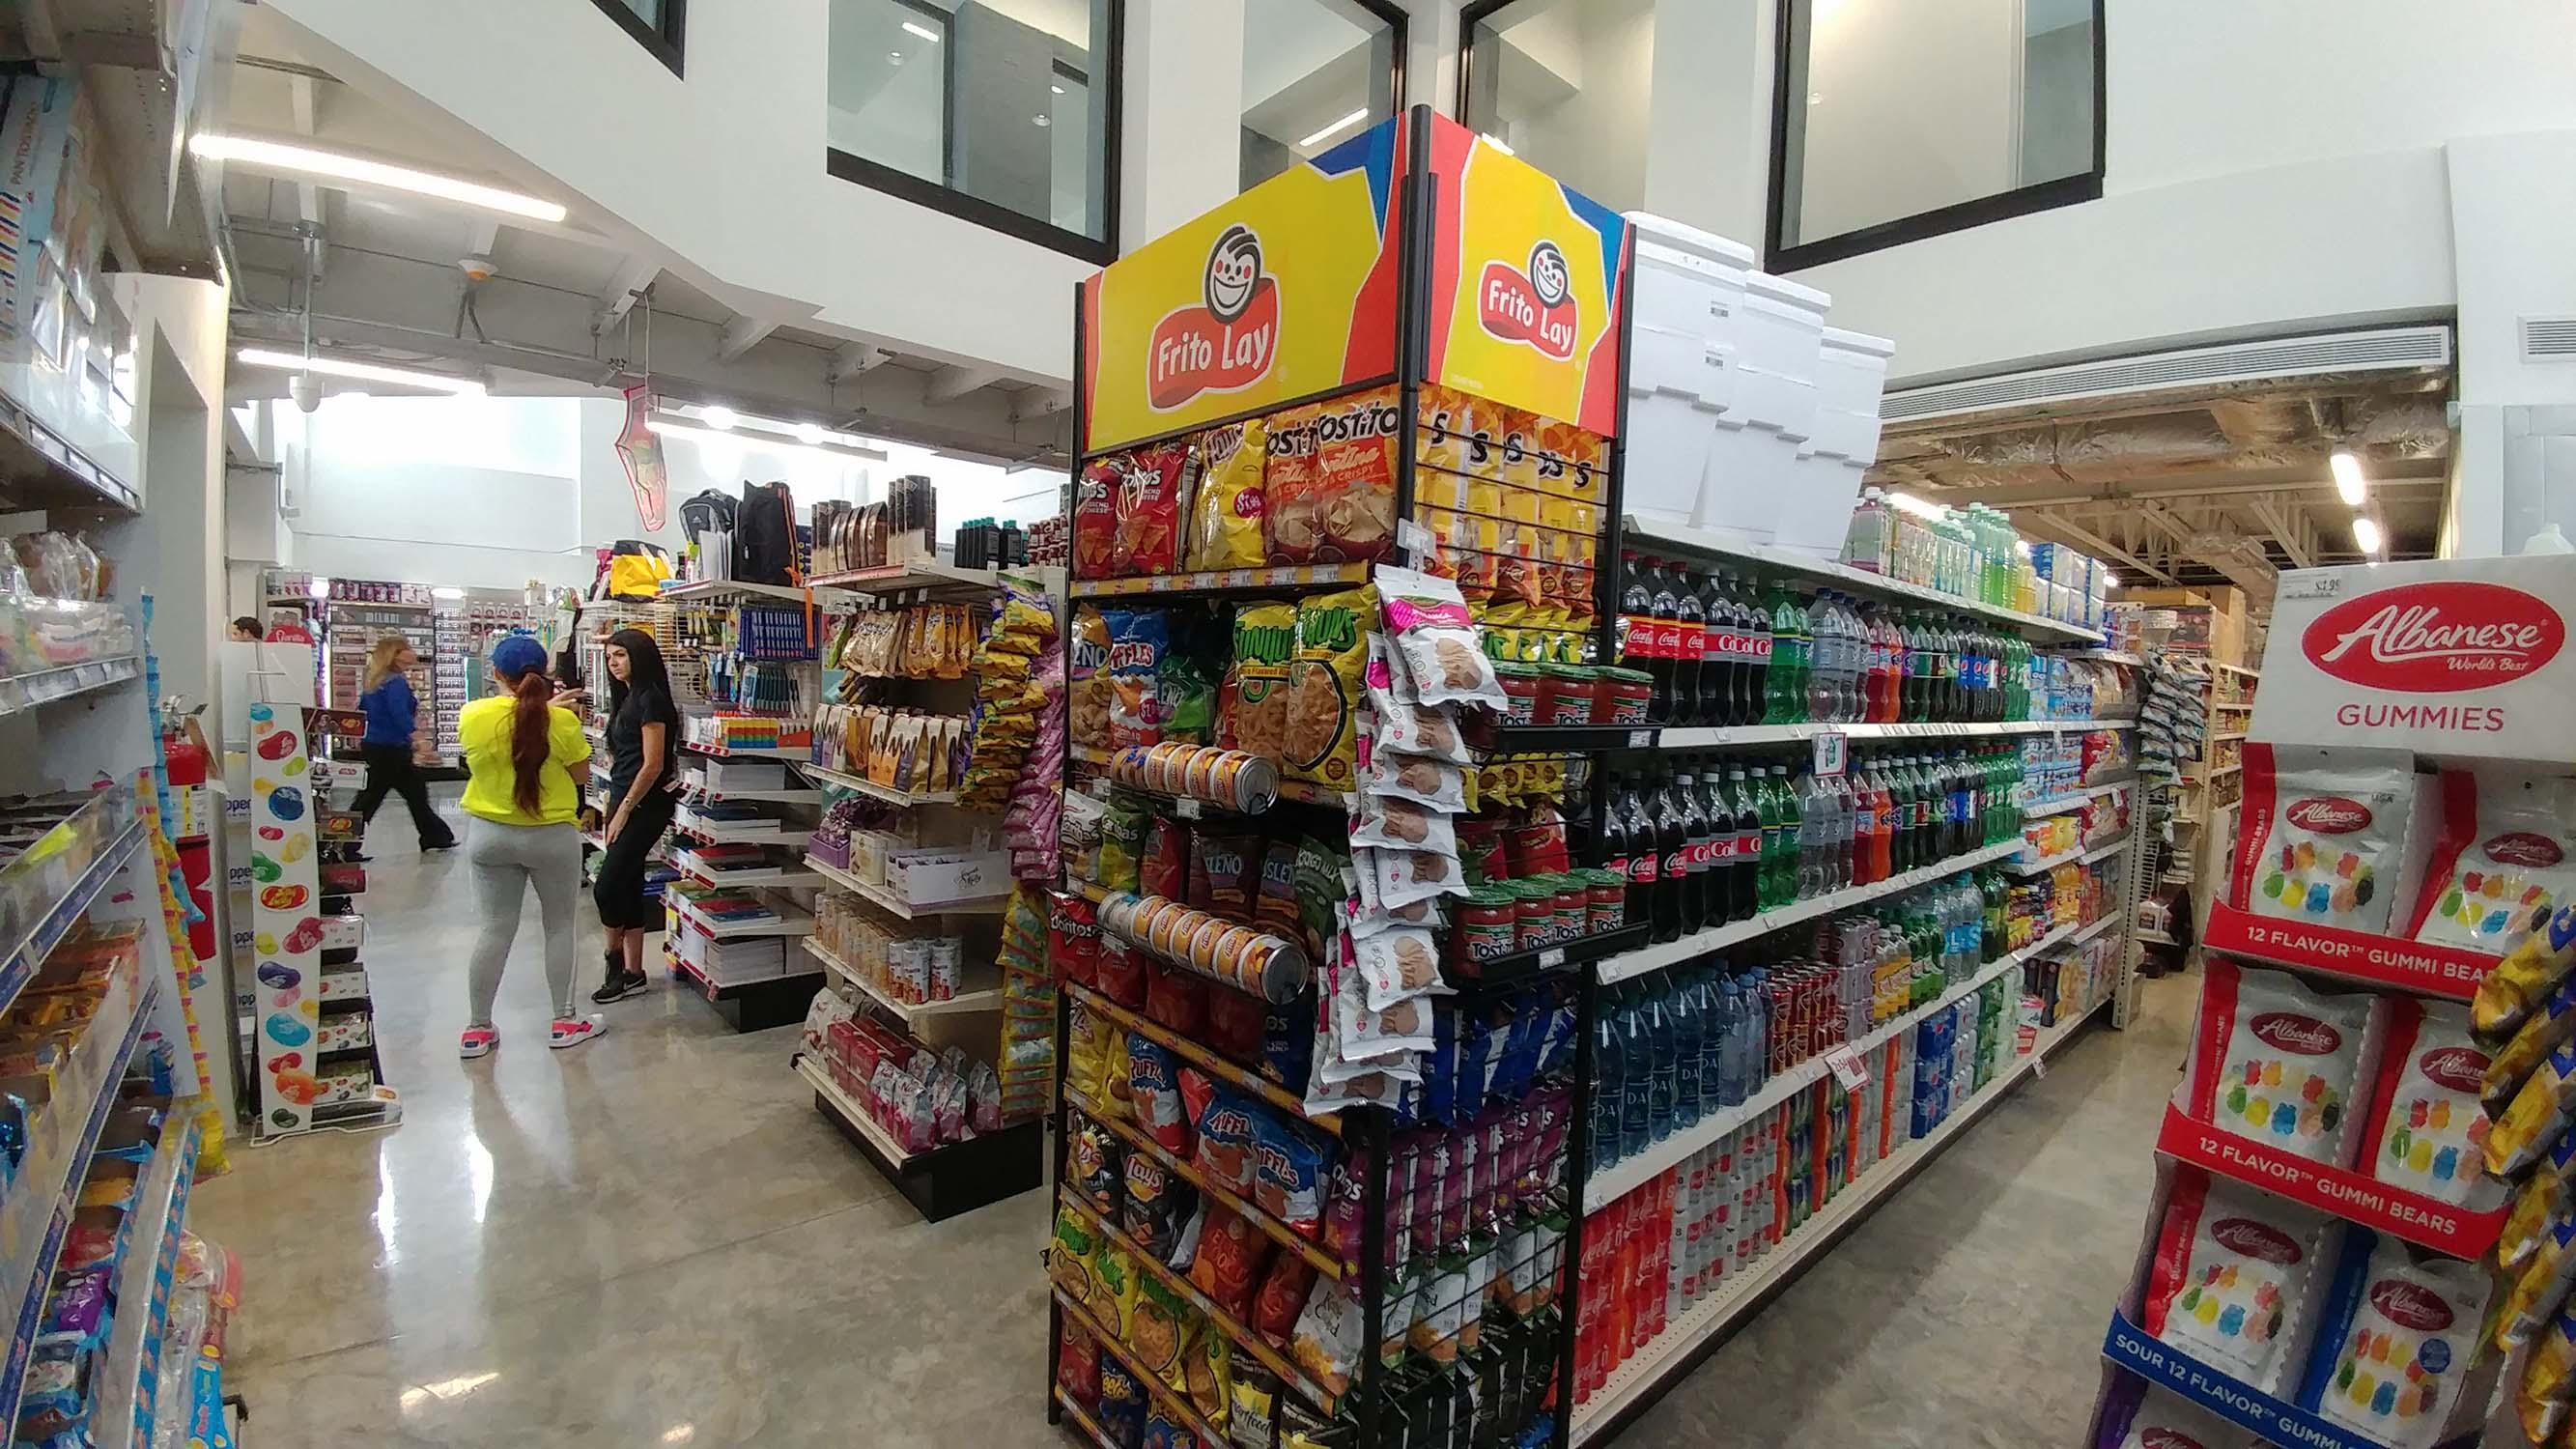 Inauguracion_Farmacias_Plaza-Plaza_del_Sol-38.jpg